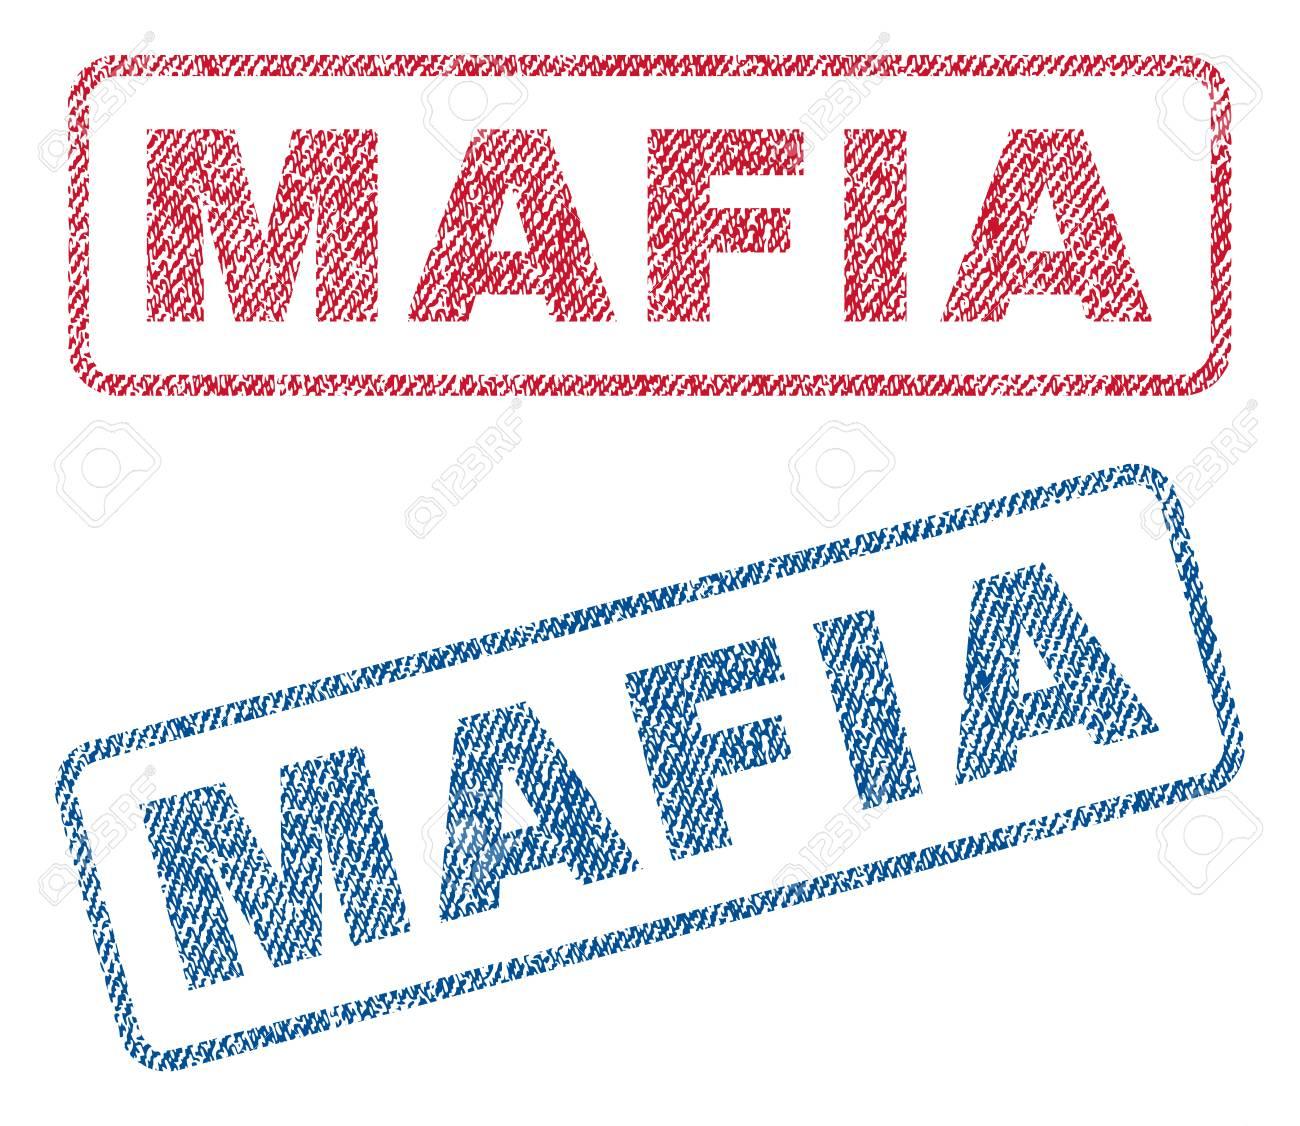 mafia text textile seal